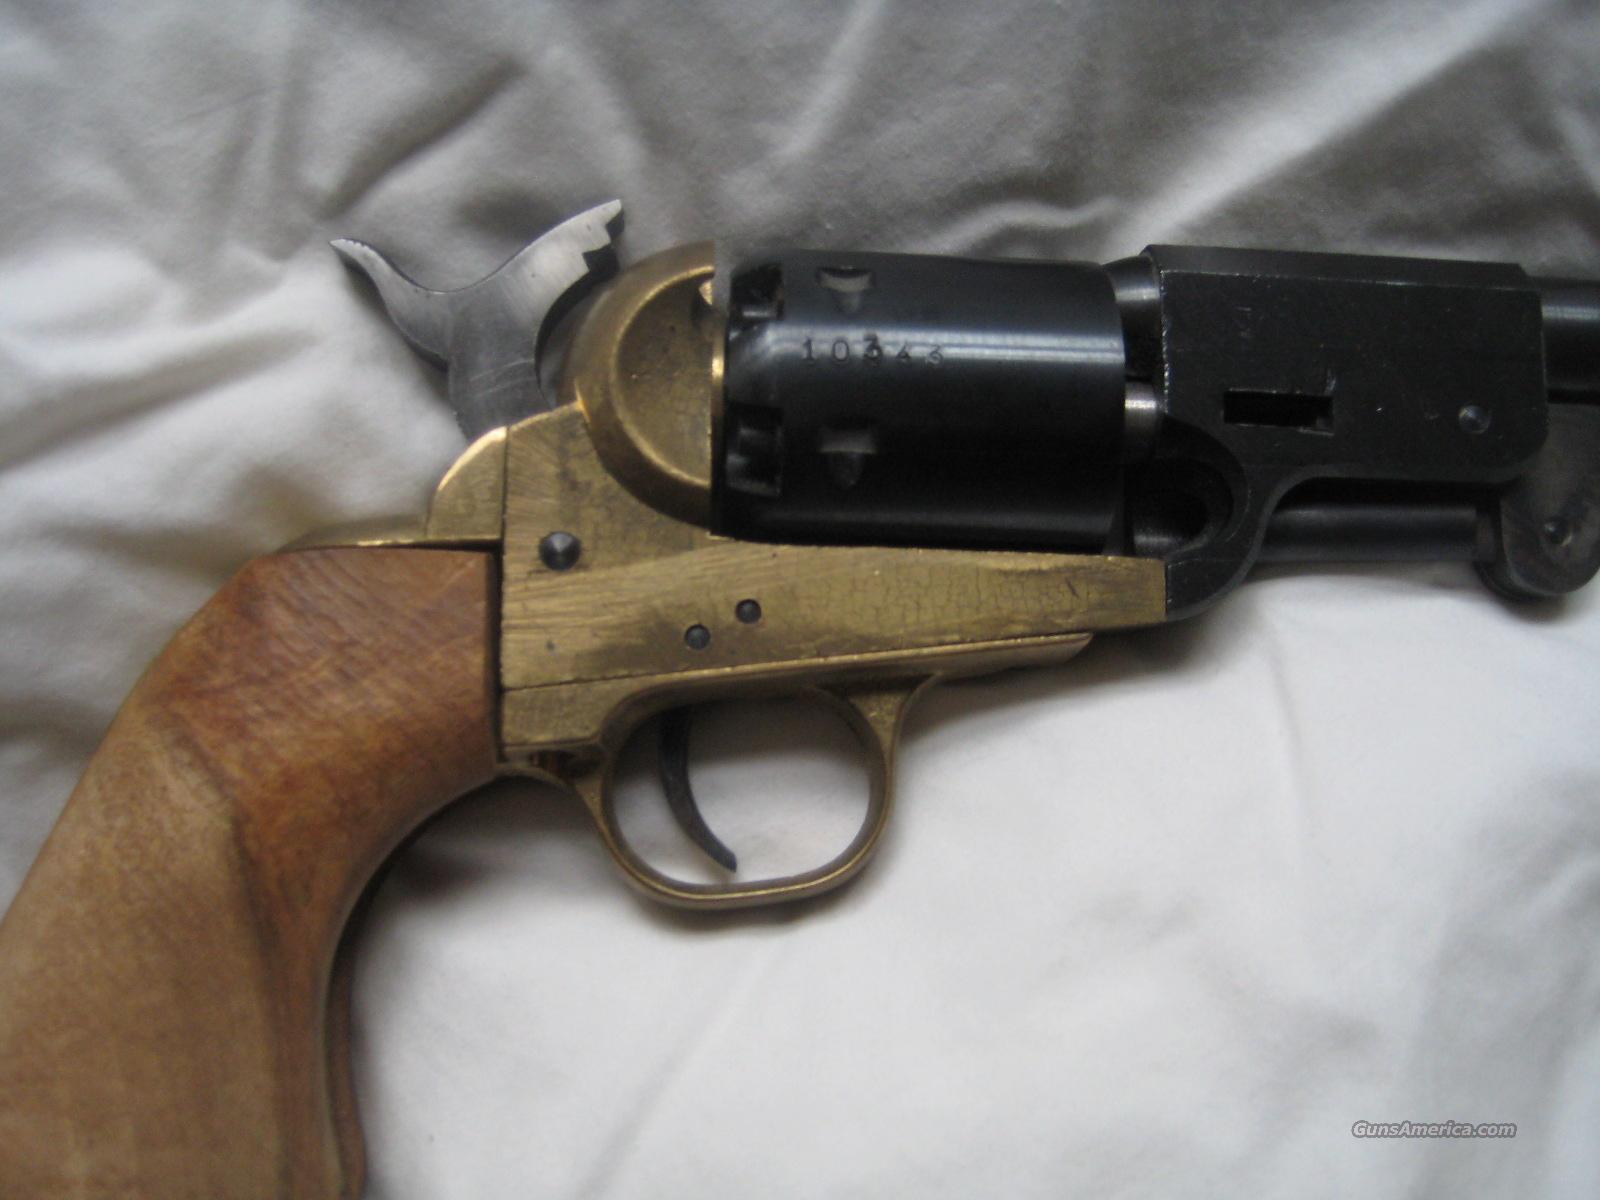 NAVY ARMS CO  MODEL 1851  36 CAL  Colt Navy replica Black Powder Percussion  Revolver